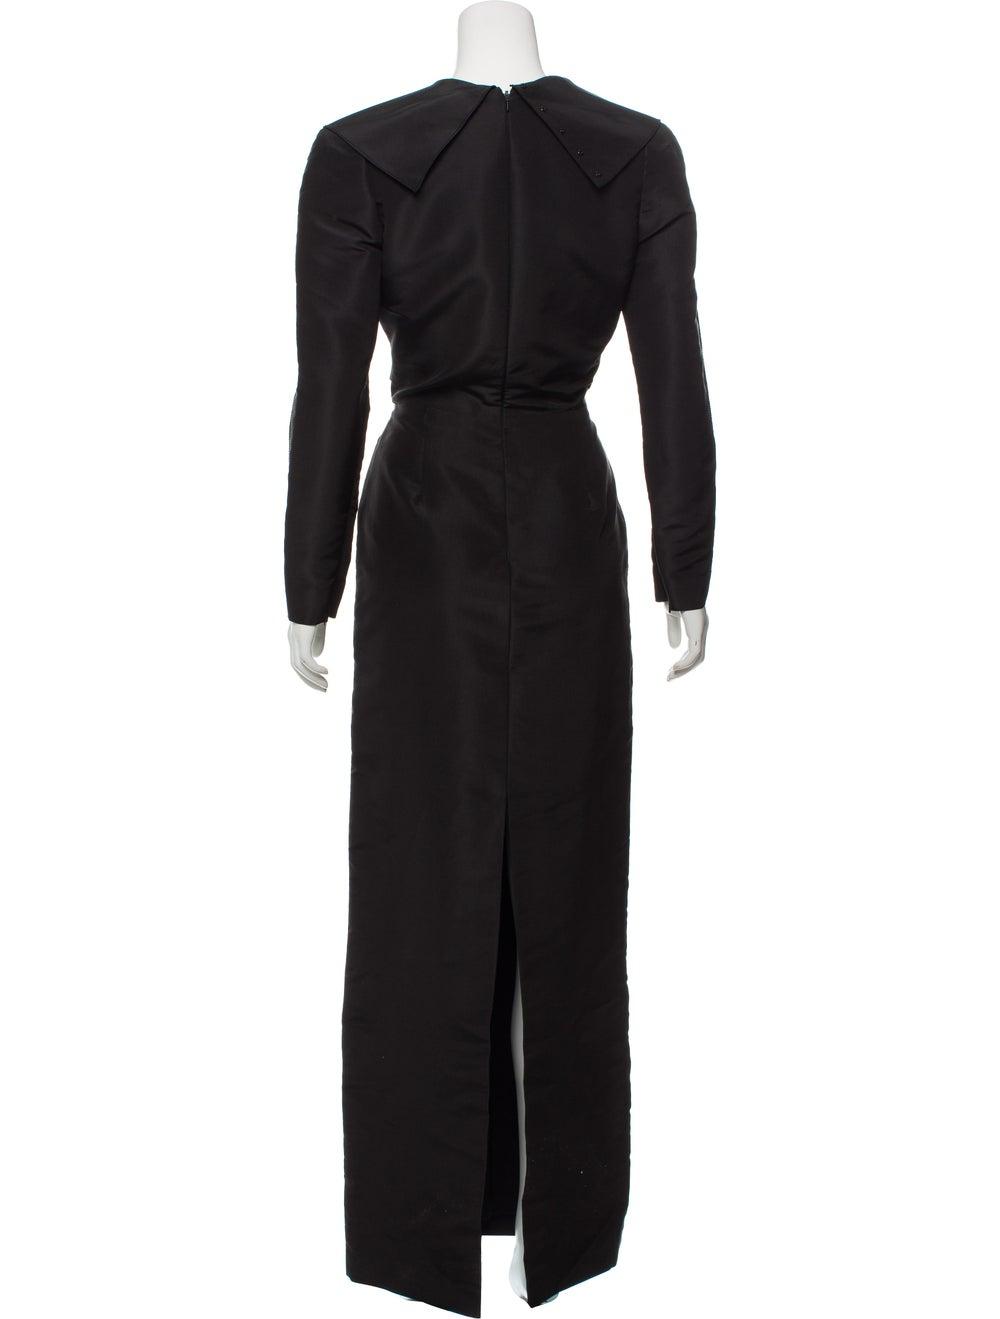 Oscar de la Renta Silk Maxi Dress Black - image 3